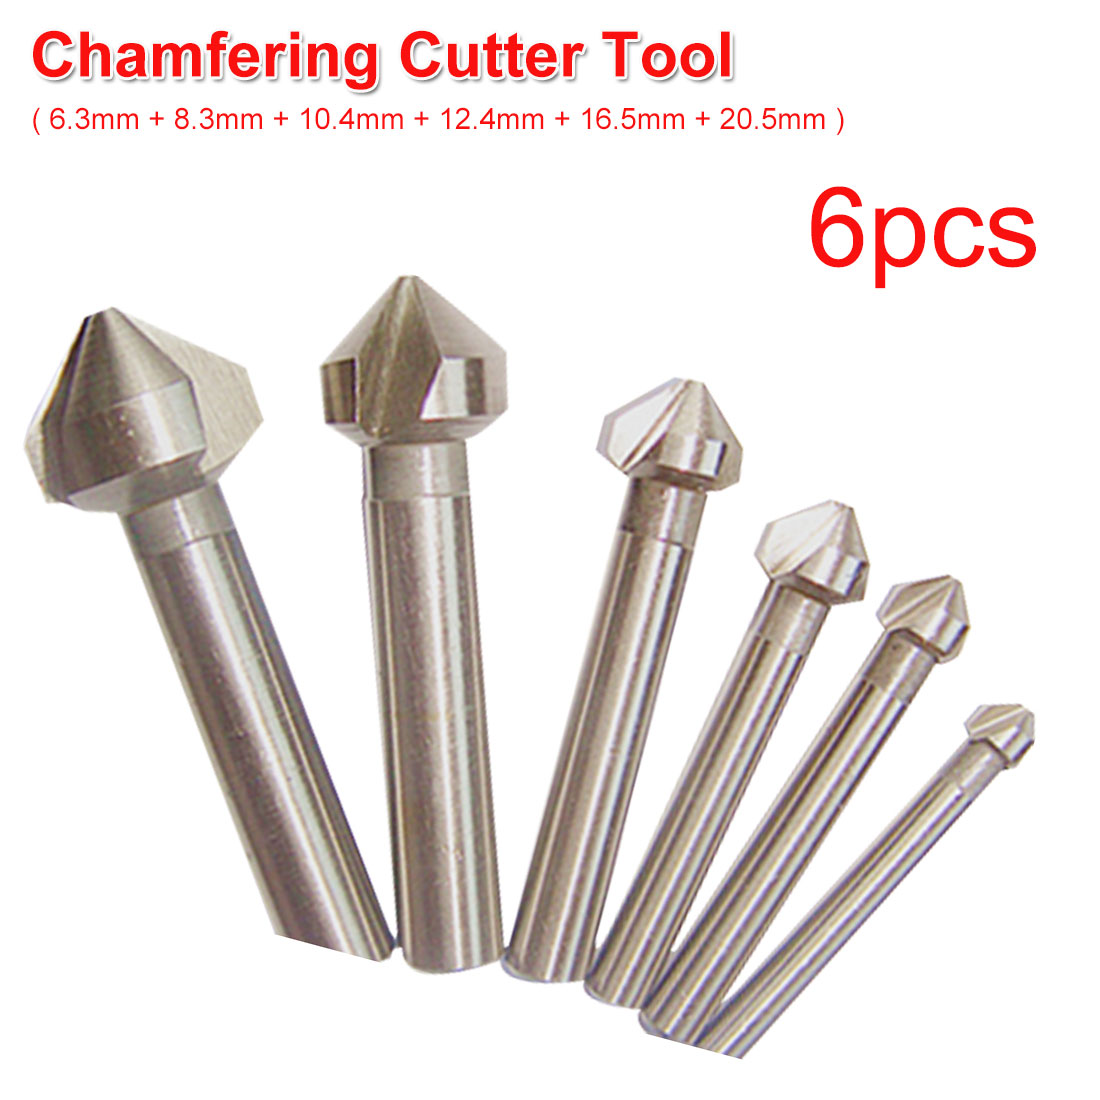 Round Shank 6pcs 3 Flute 90 Degree HSS Chamfer Chamfering Cutter End Mill Tool Countersink Drill Bit Set 6.3mm-20.5mm